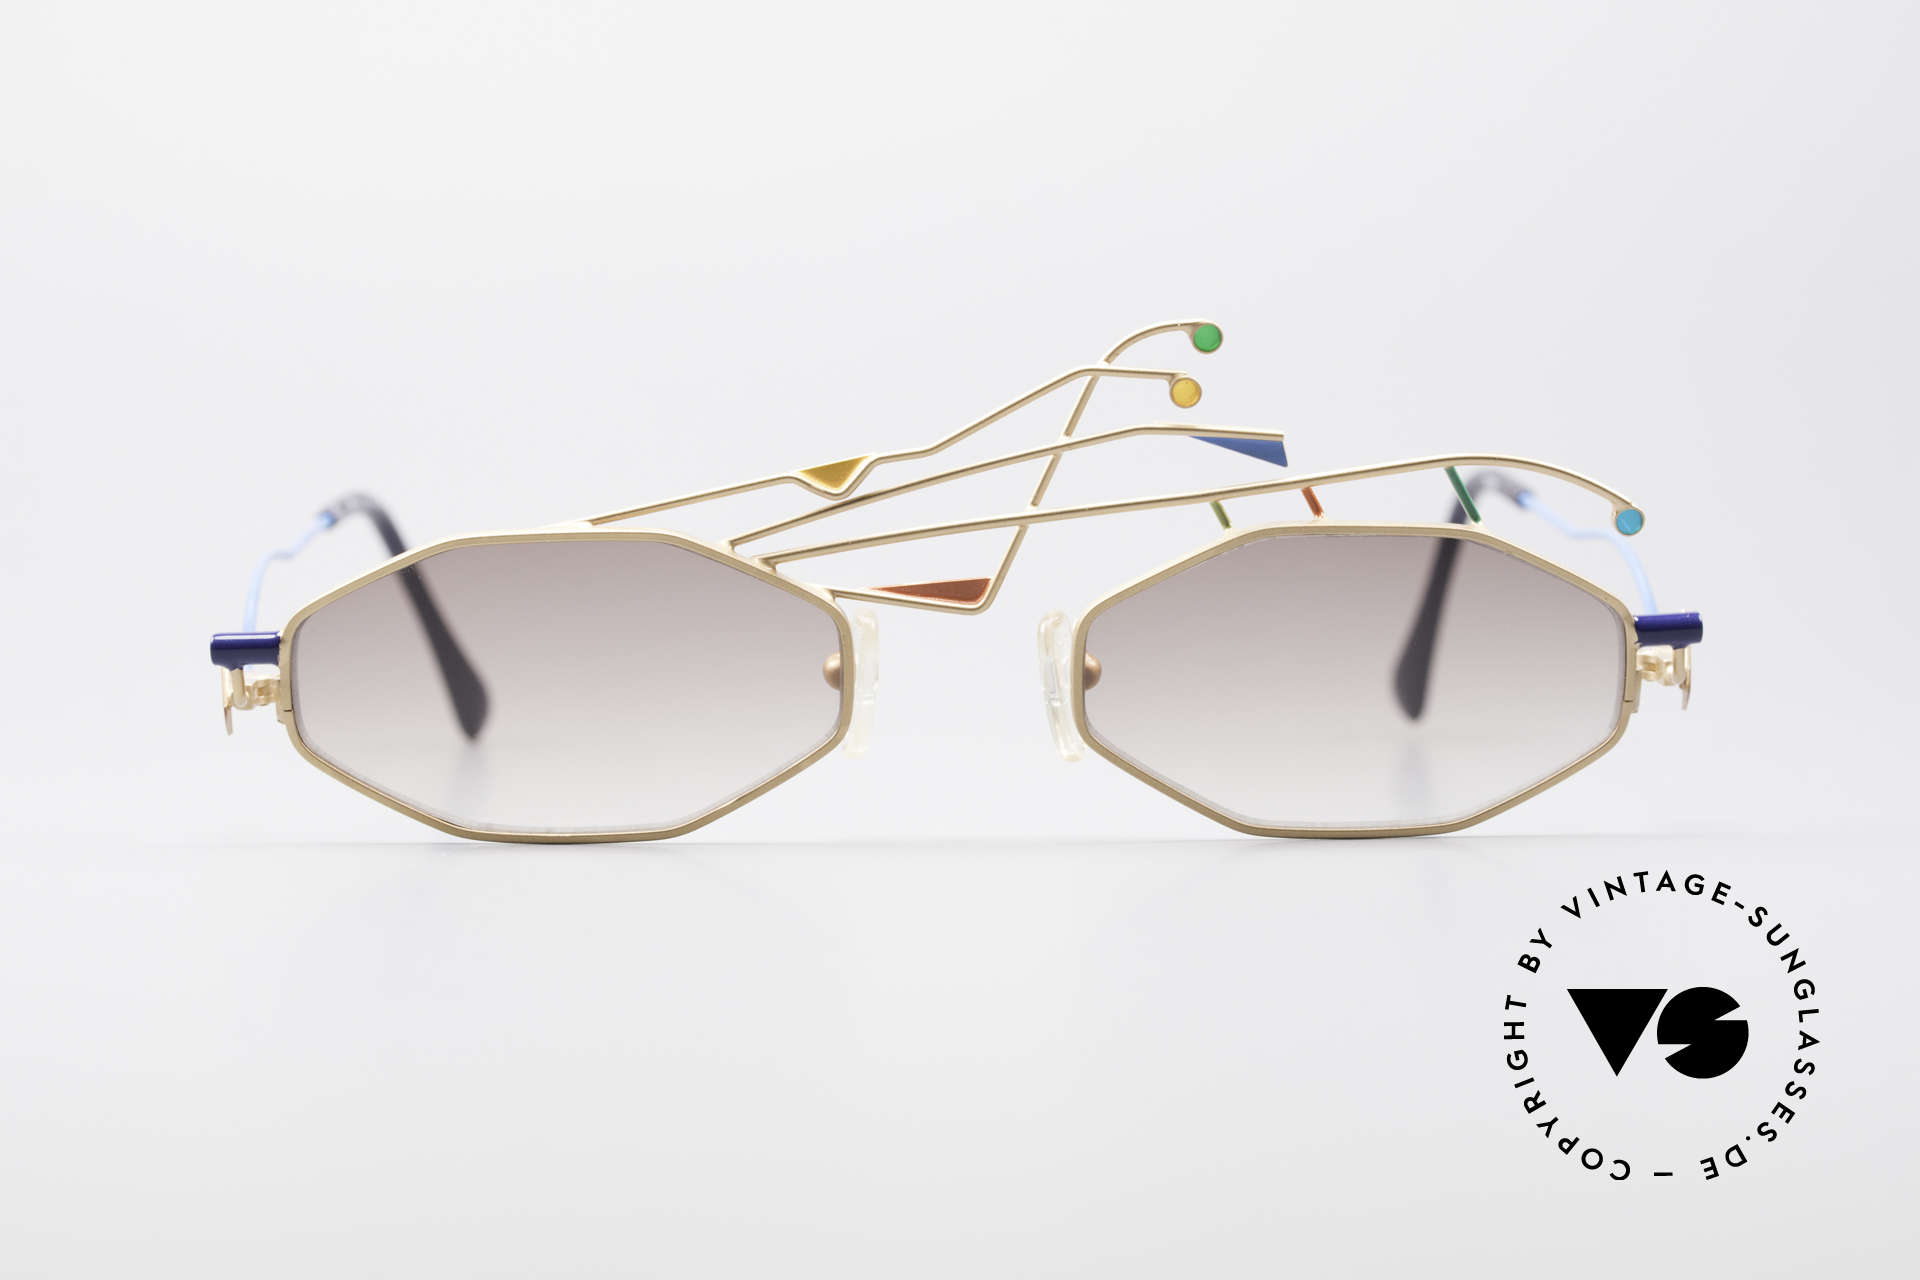 02075b4751 Sunglasses Casanova Estate Limited 90 s Sunglasses